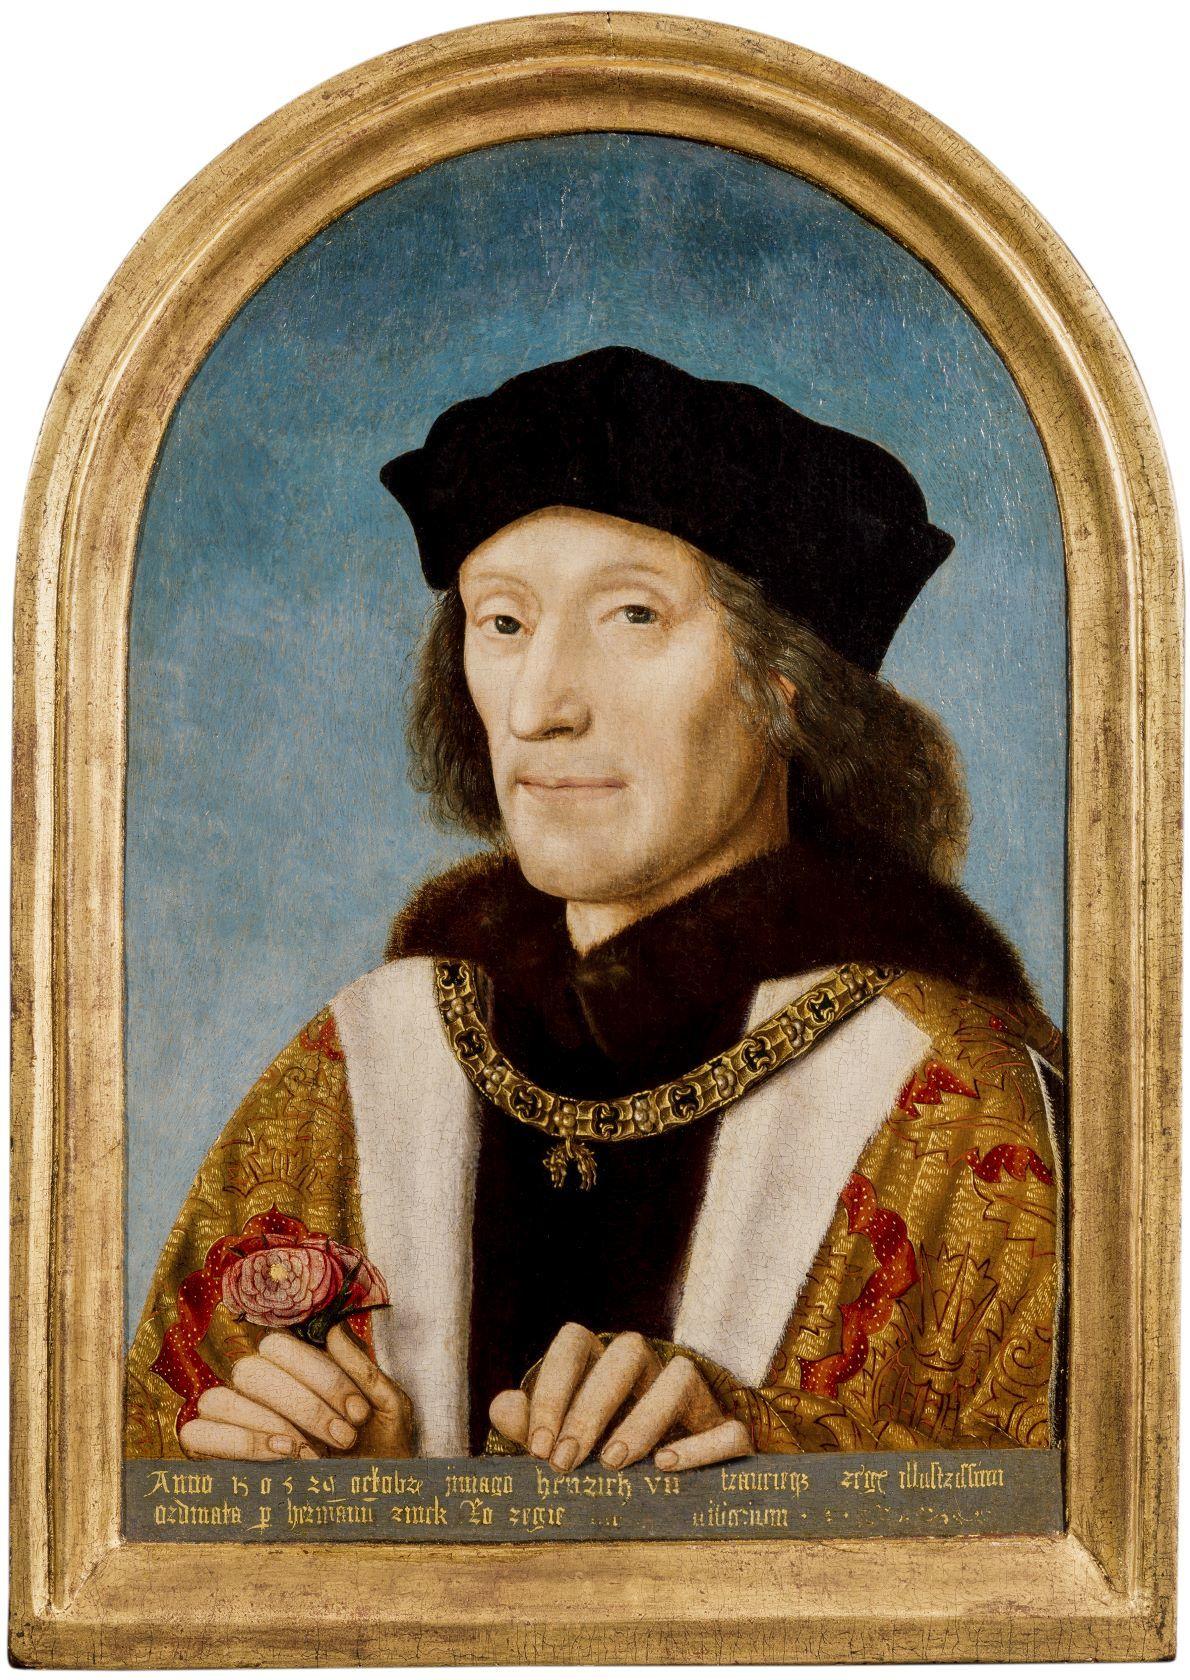 Henry Vii Copyright National Portrait Gallery London 2 Mb